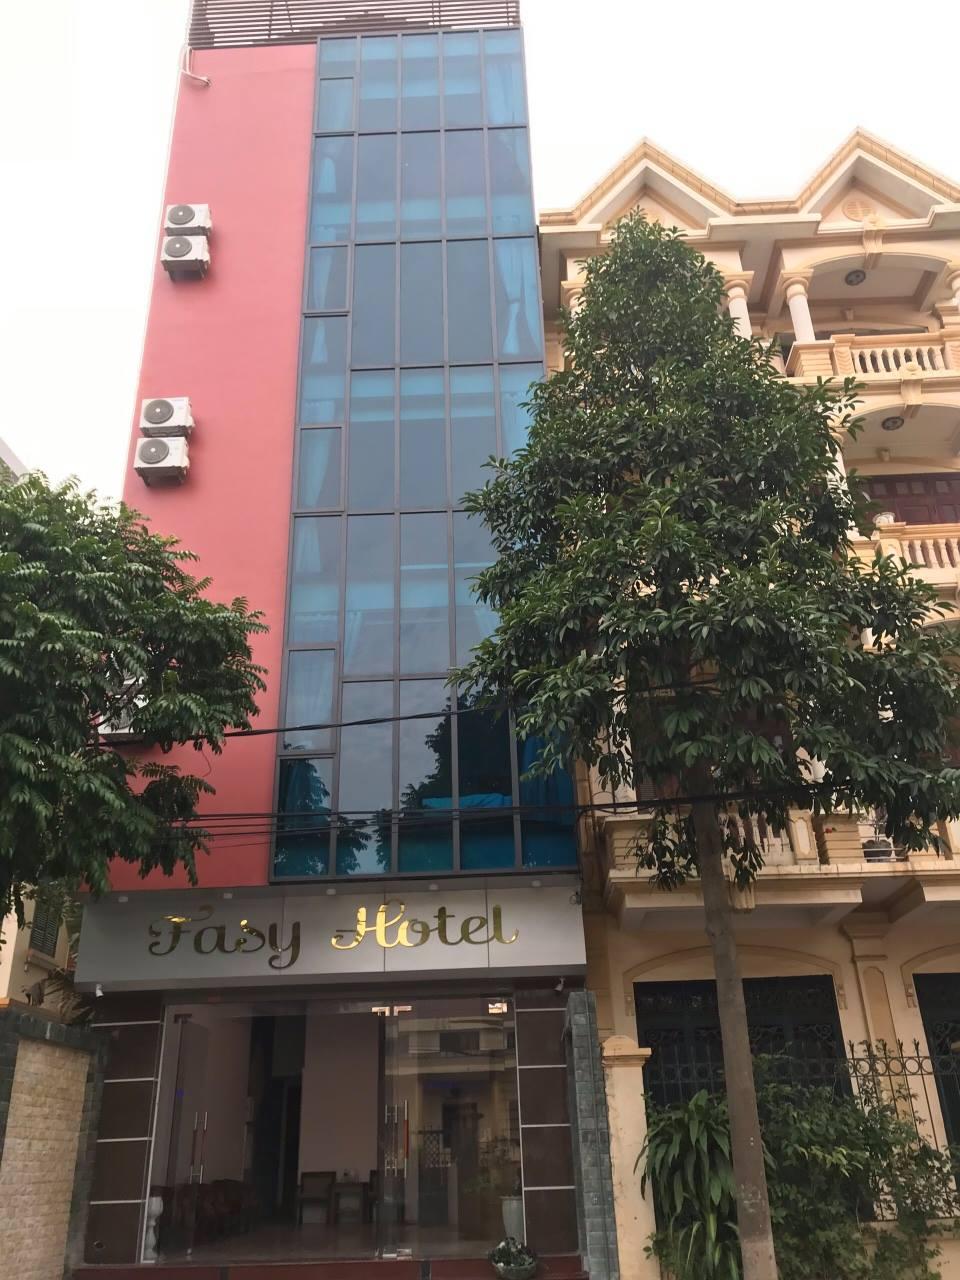 Fasy Hotel